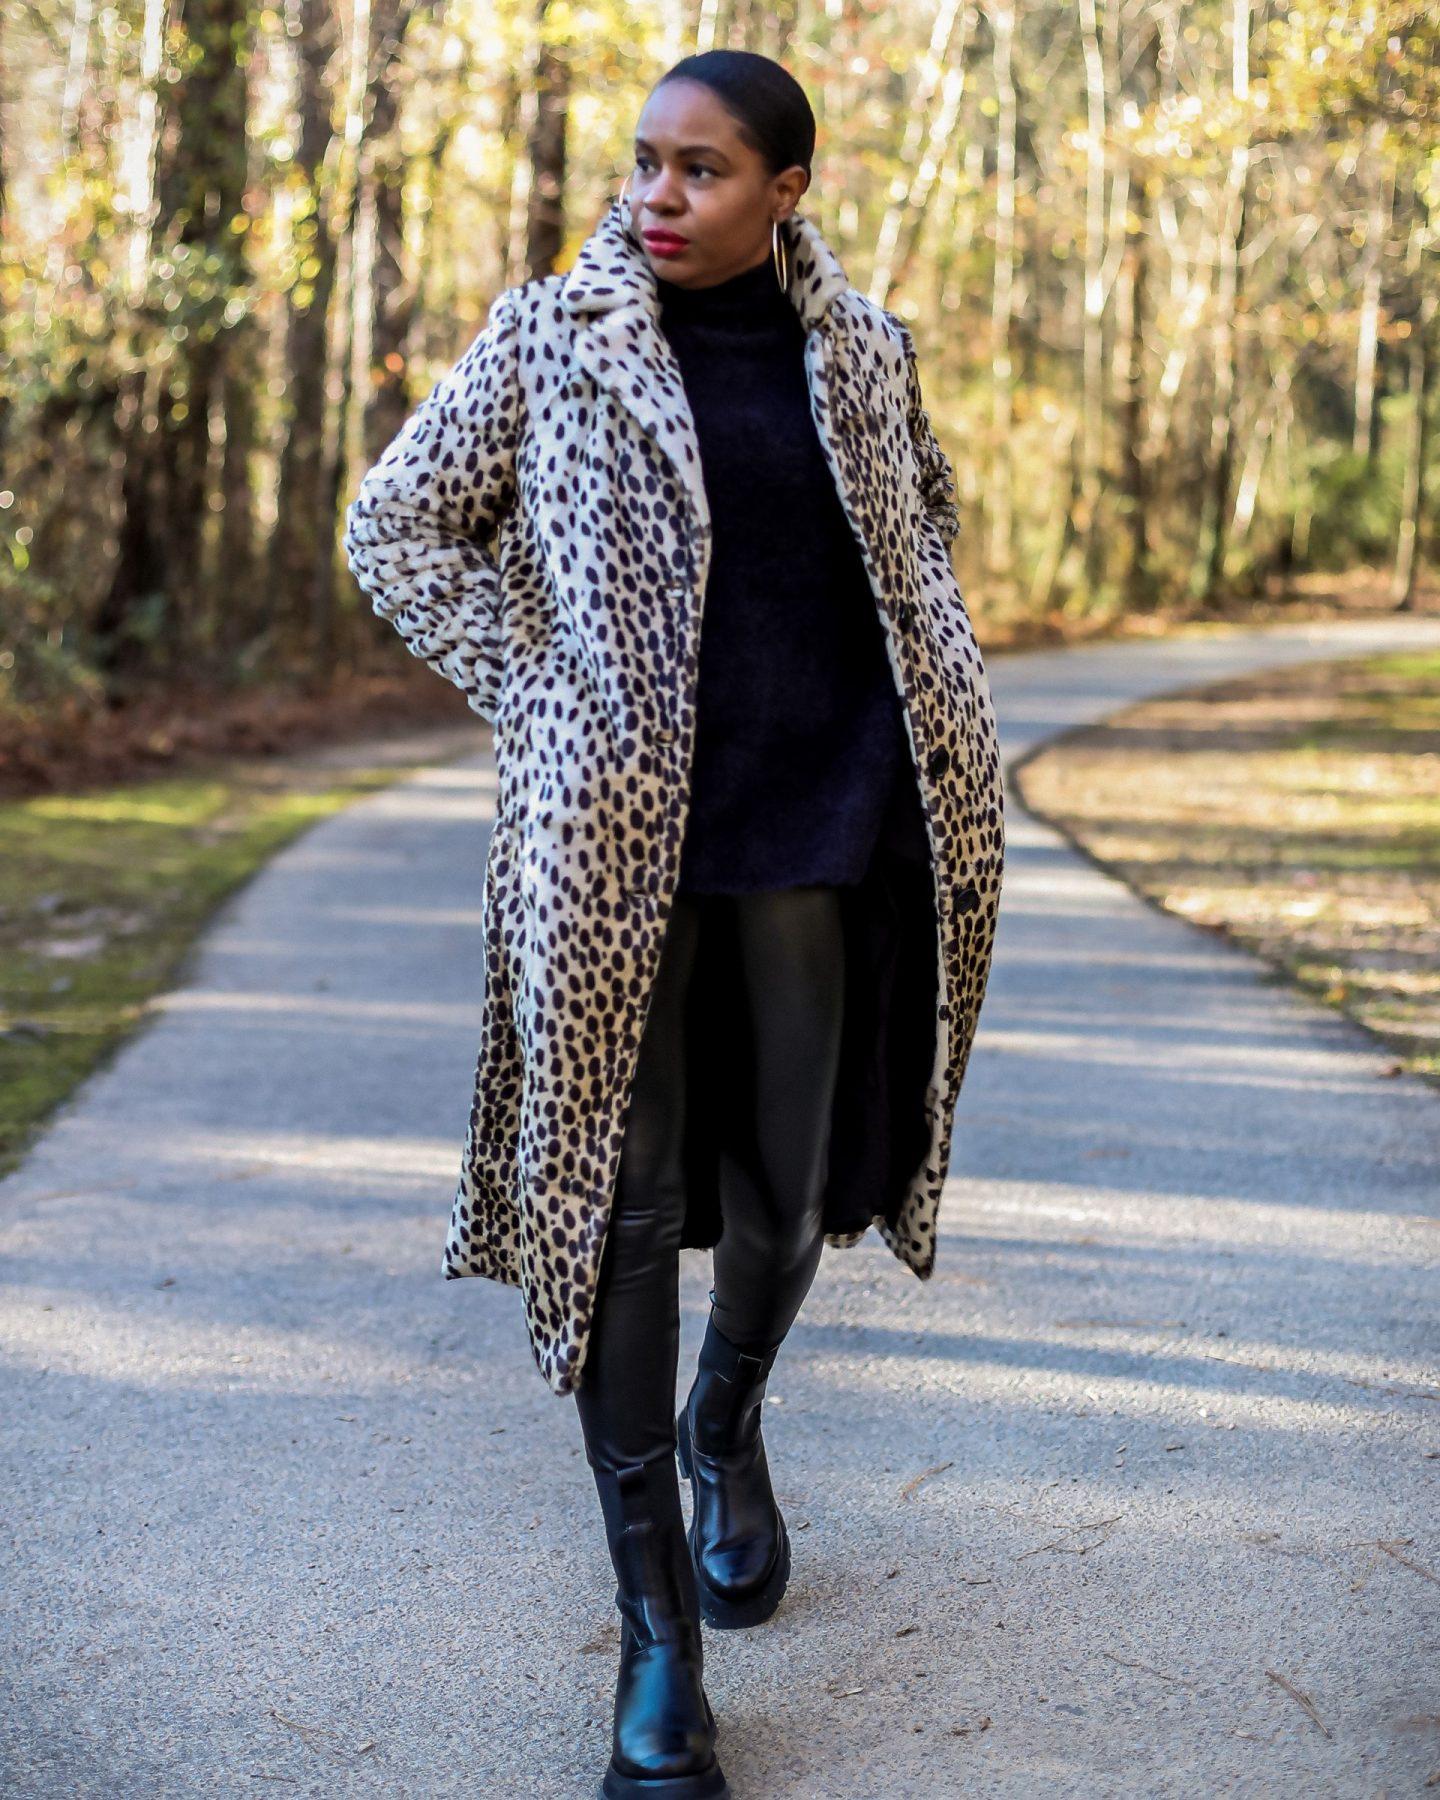 walmart faux fur coat, leopard coat, how to style a faux fur coat for the holidays, holiday coat, leopard coat, long leopard coat, walmart fashion